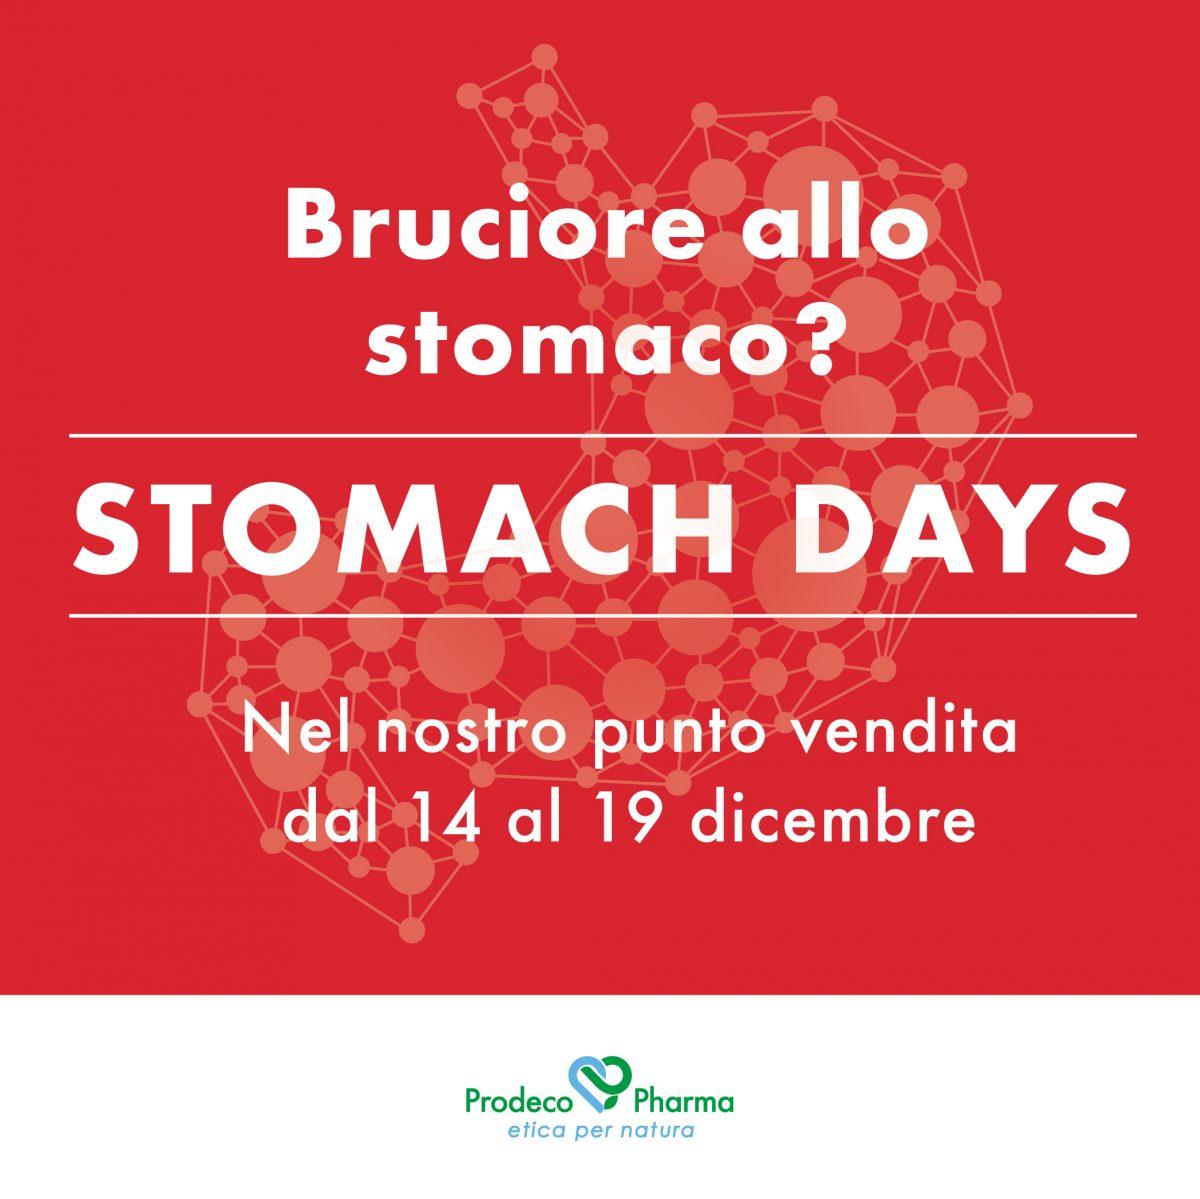 Stomach-days_3-1200x1199.jpg